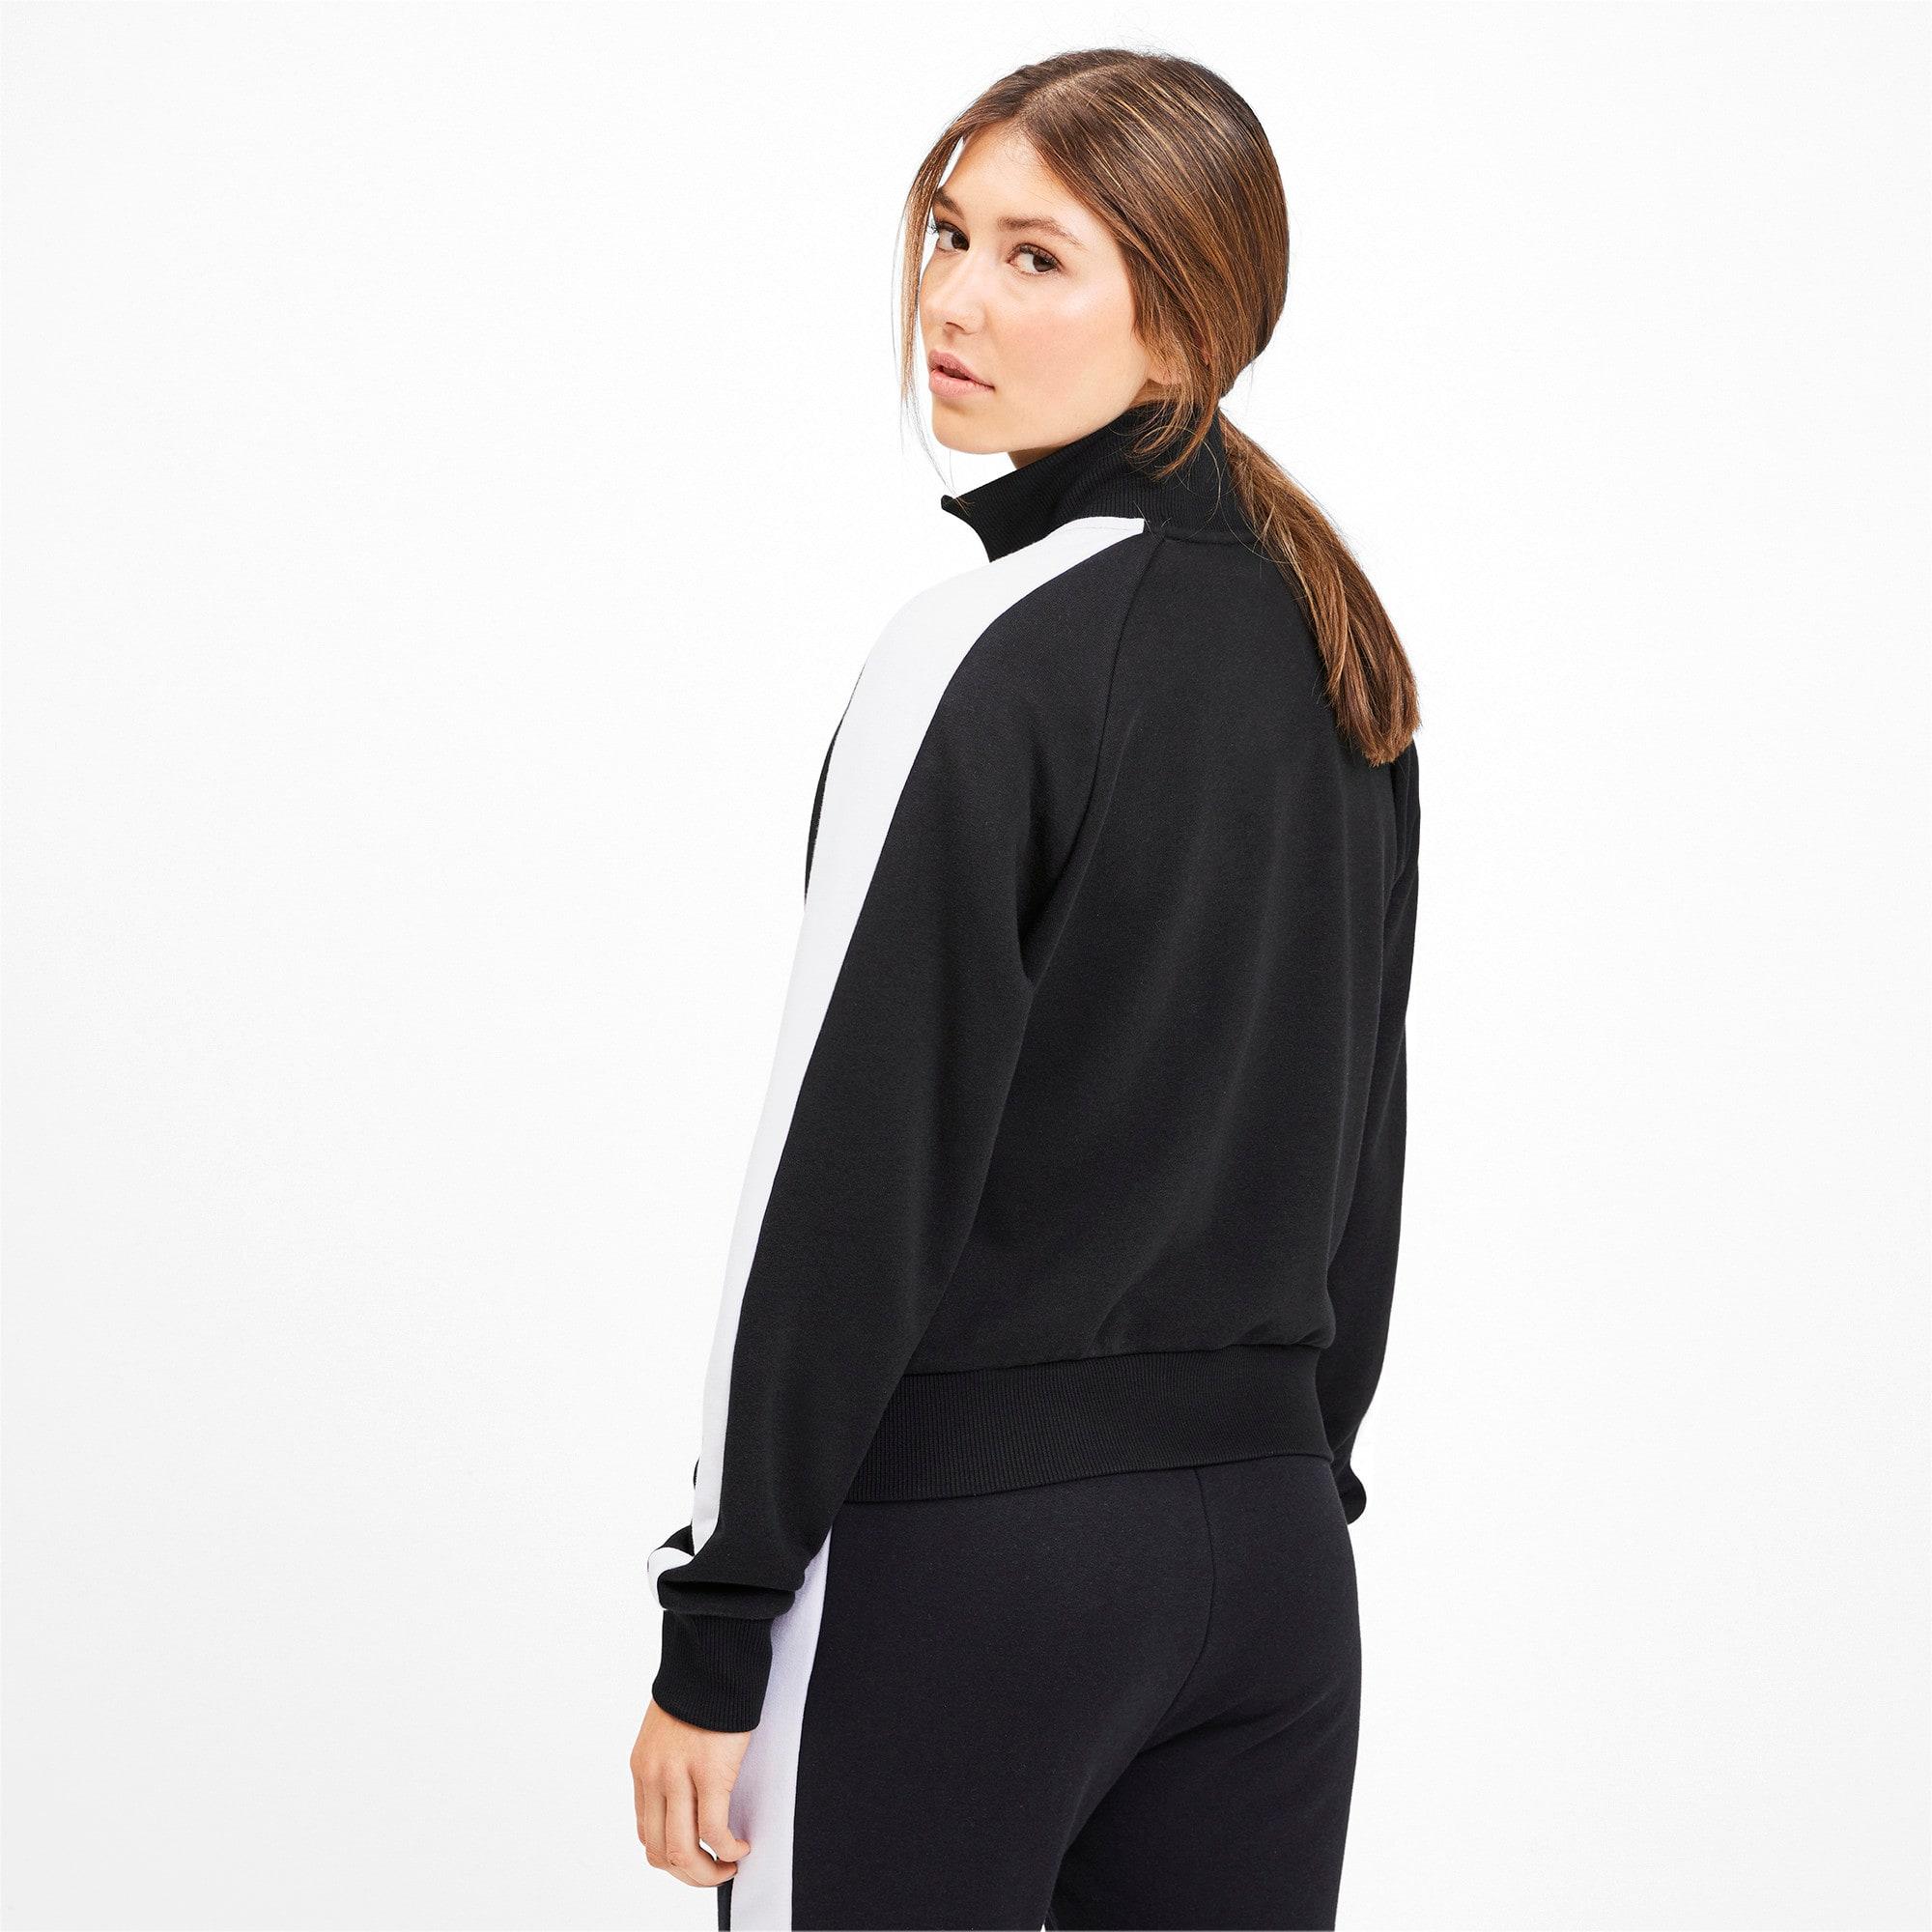 Thumbnail 3 of Classics T7 Women's Track Jacket, Puma Black, medium